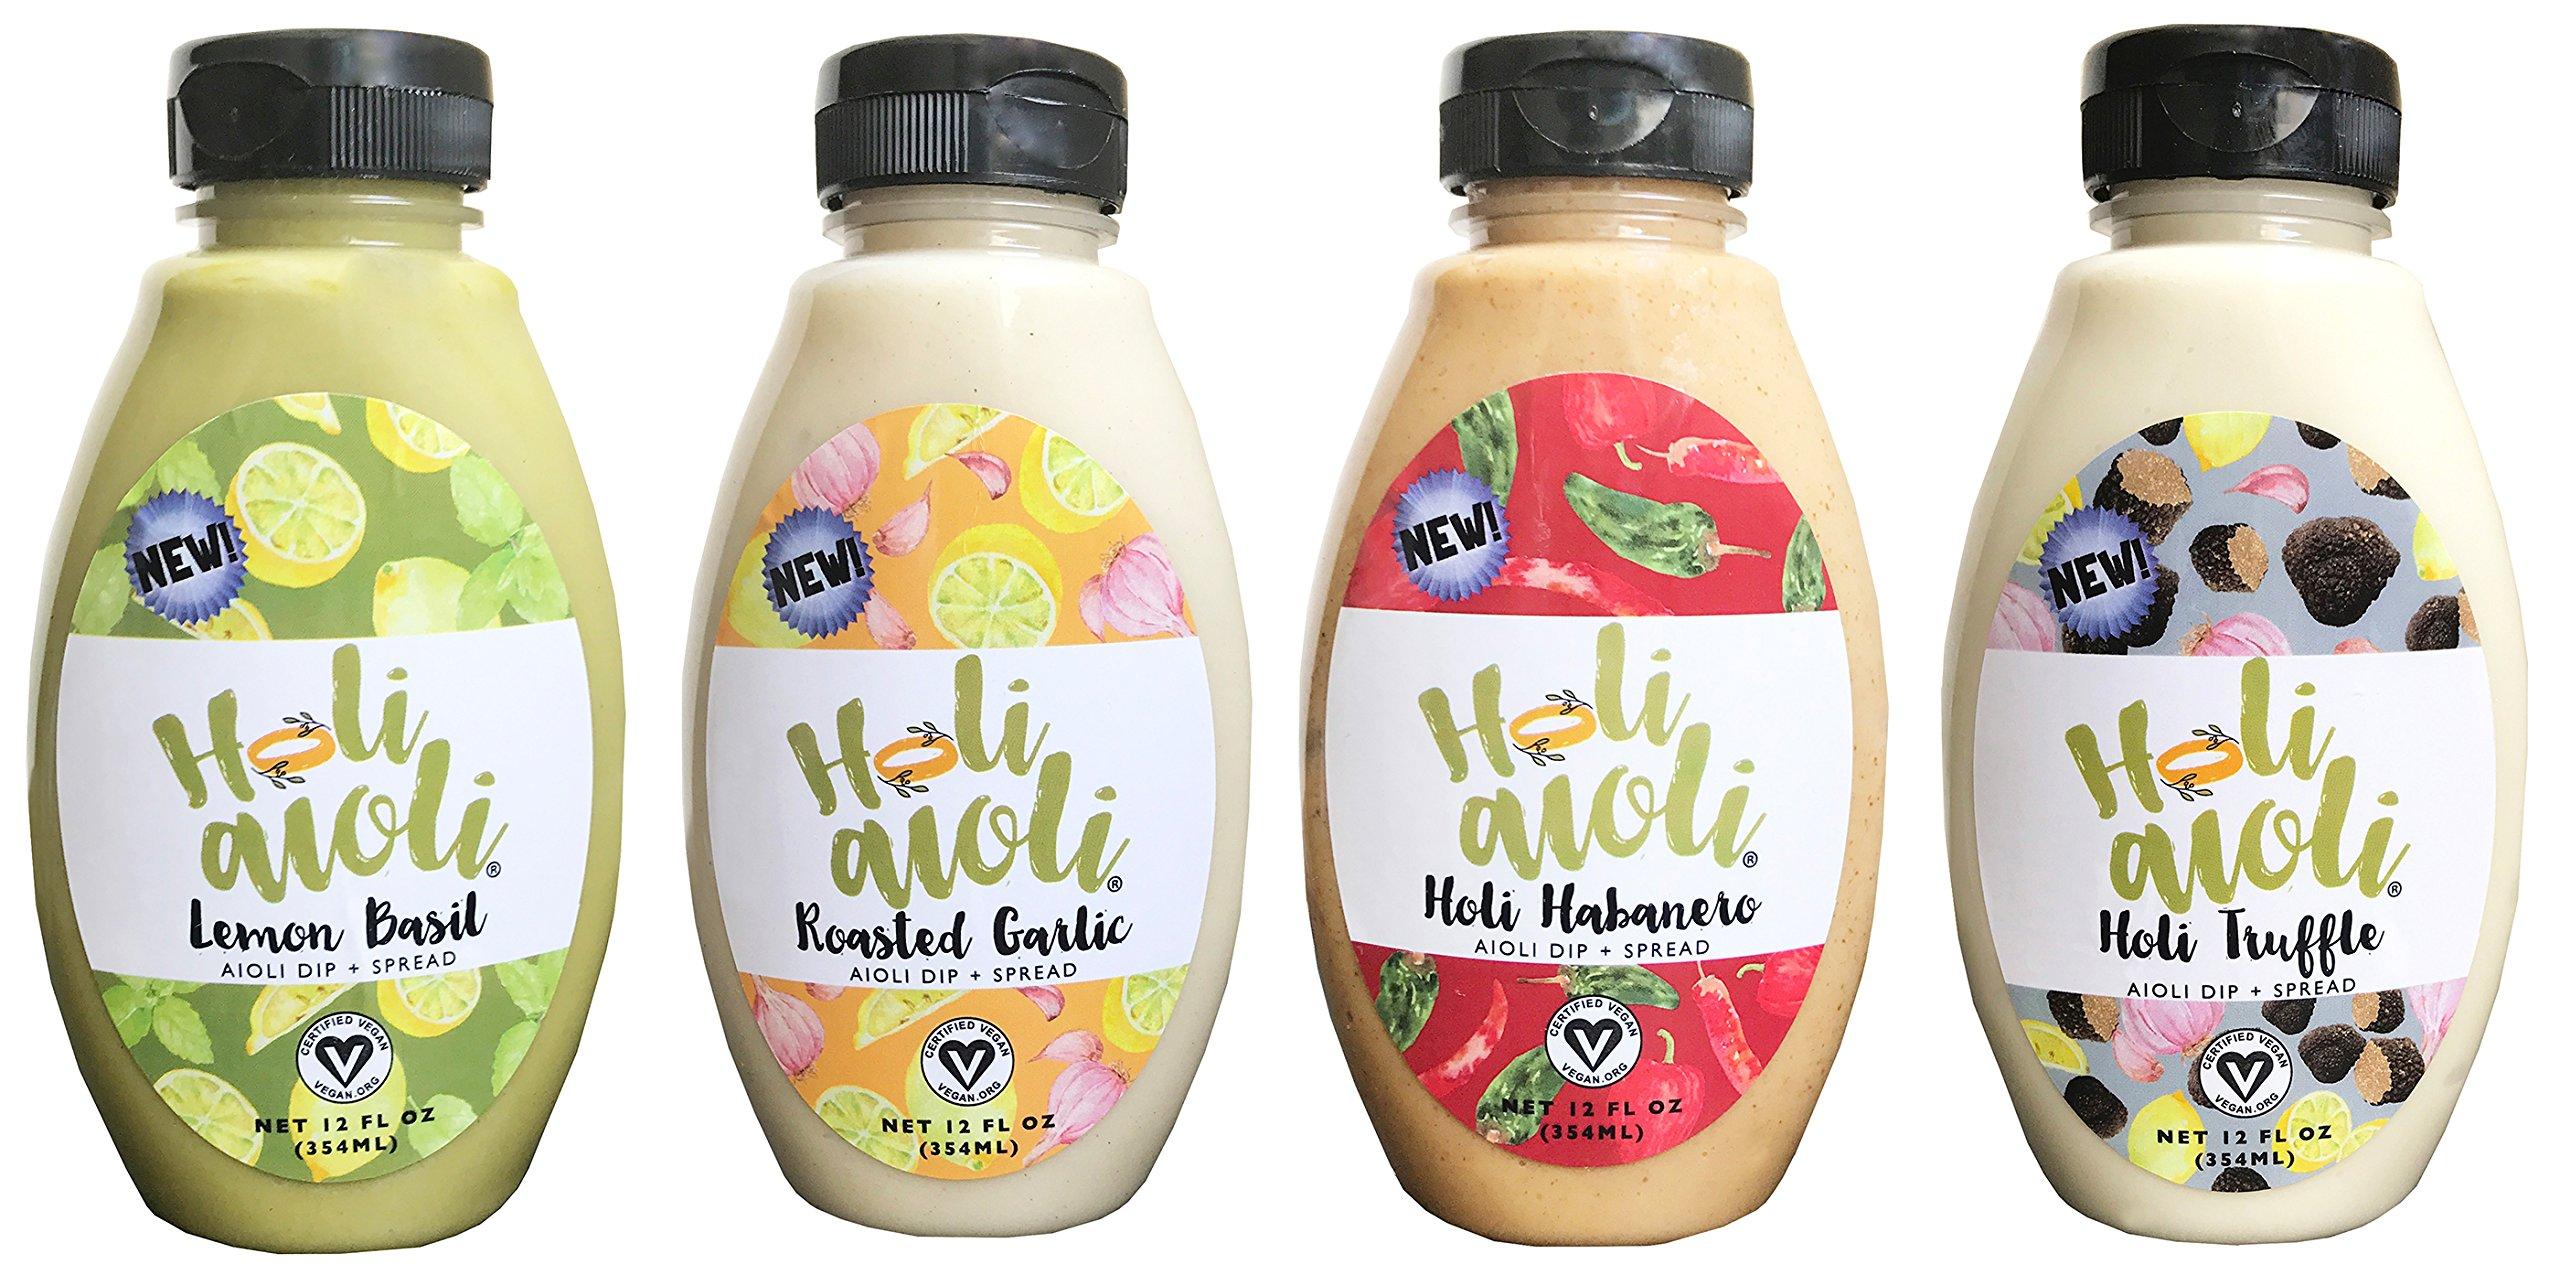 Holi Aioli Variety Pack - Habanero, Truffle, Lemon Basil & Roasted Garlic Sandwich Spread & Mayonnaise Alternative - Vegan Dressing Dip - Mayo Replacement Salad Dressing - 12 Fluid Ounces, Pack of 4